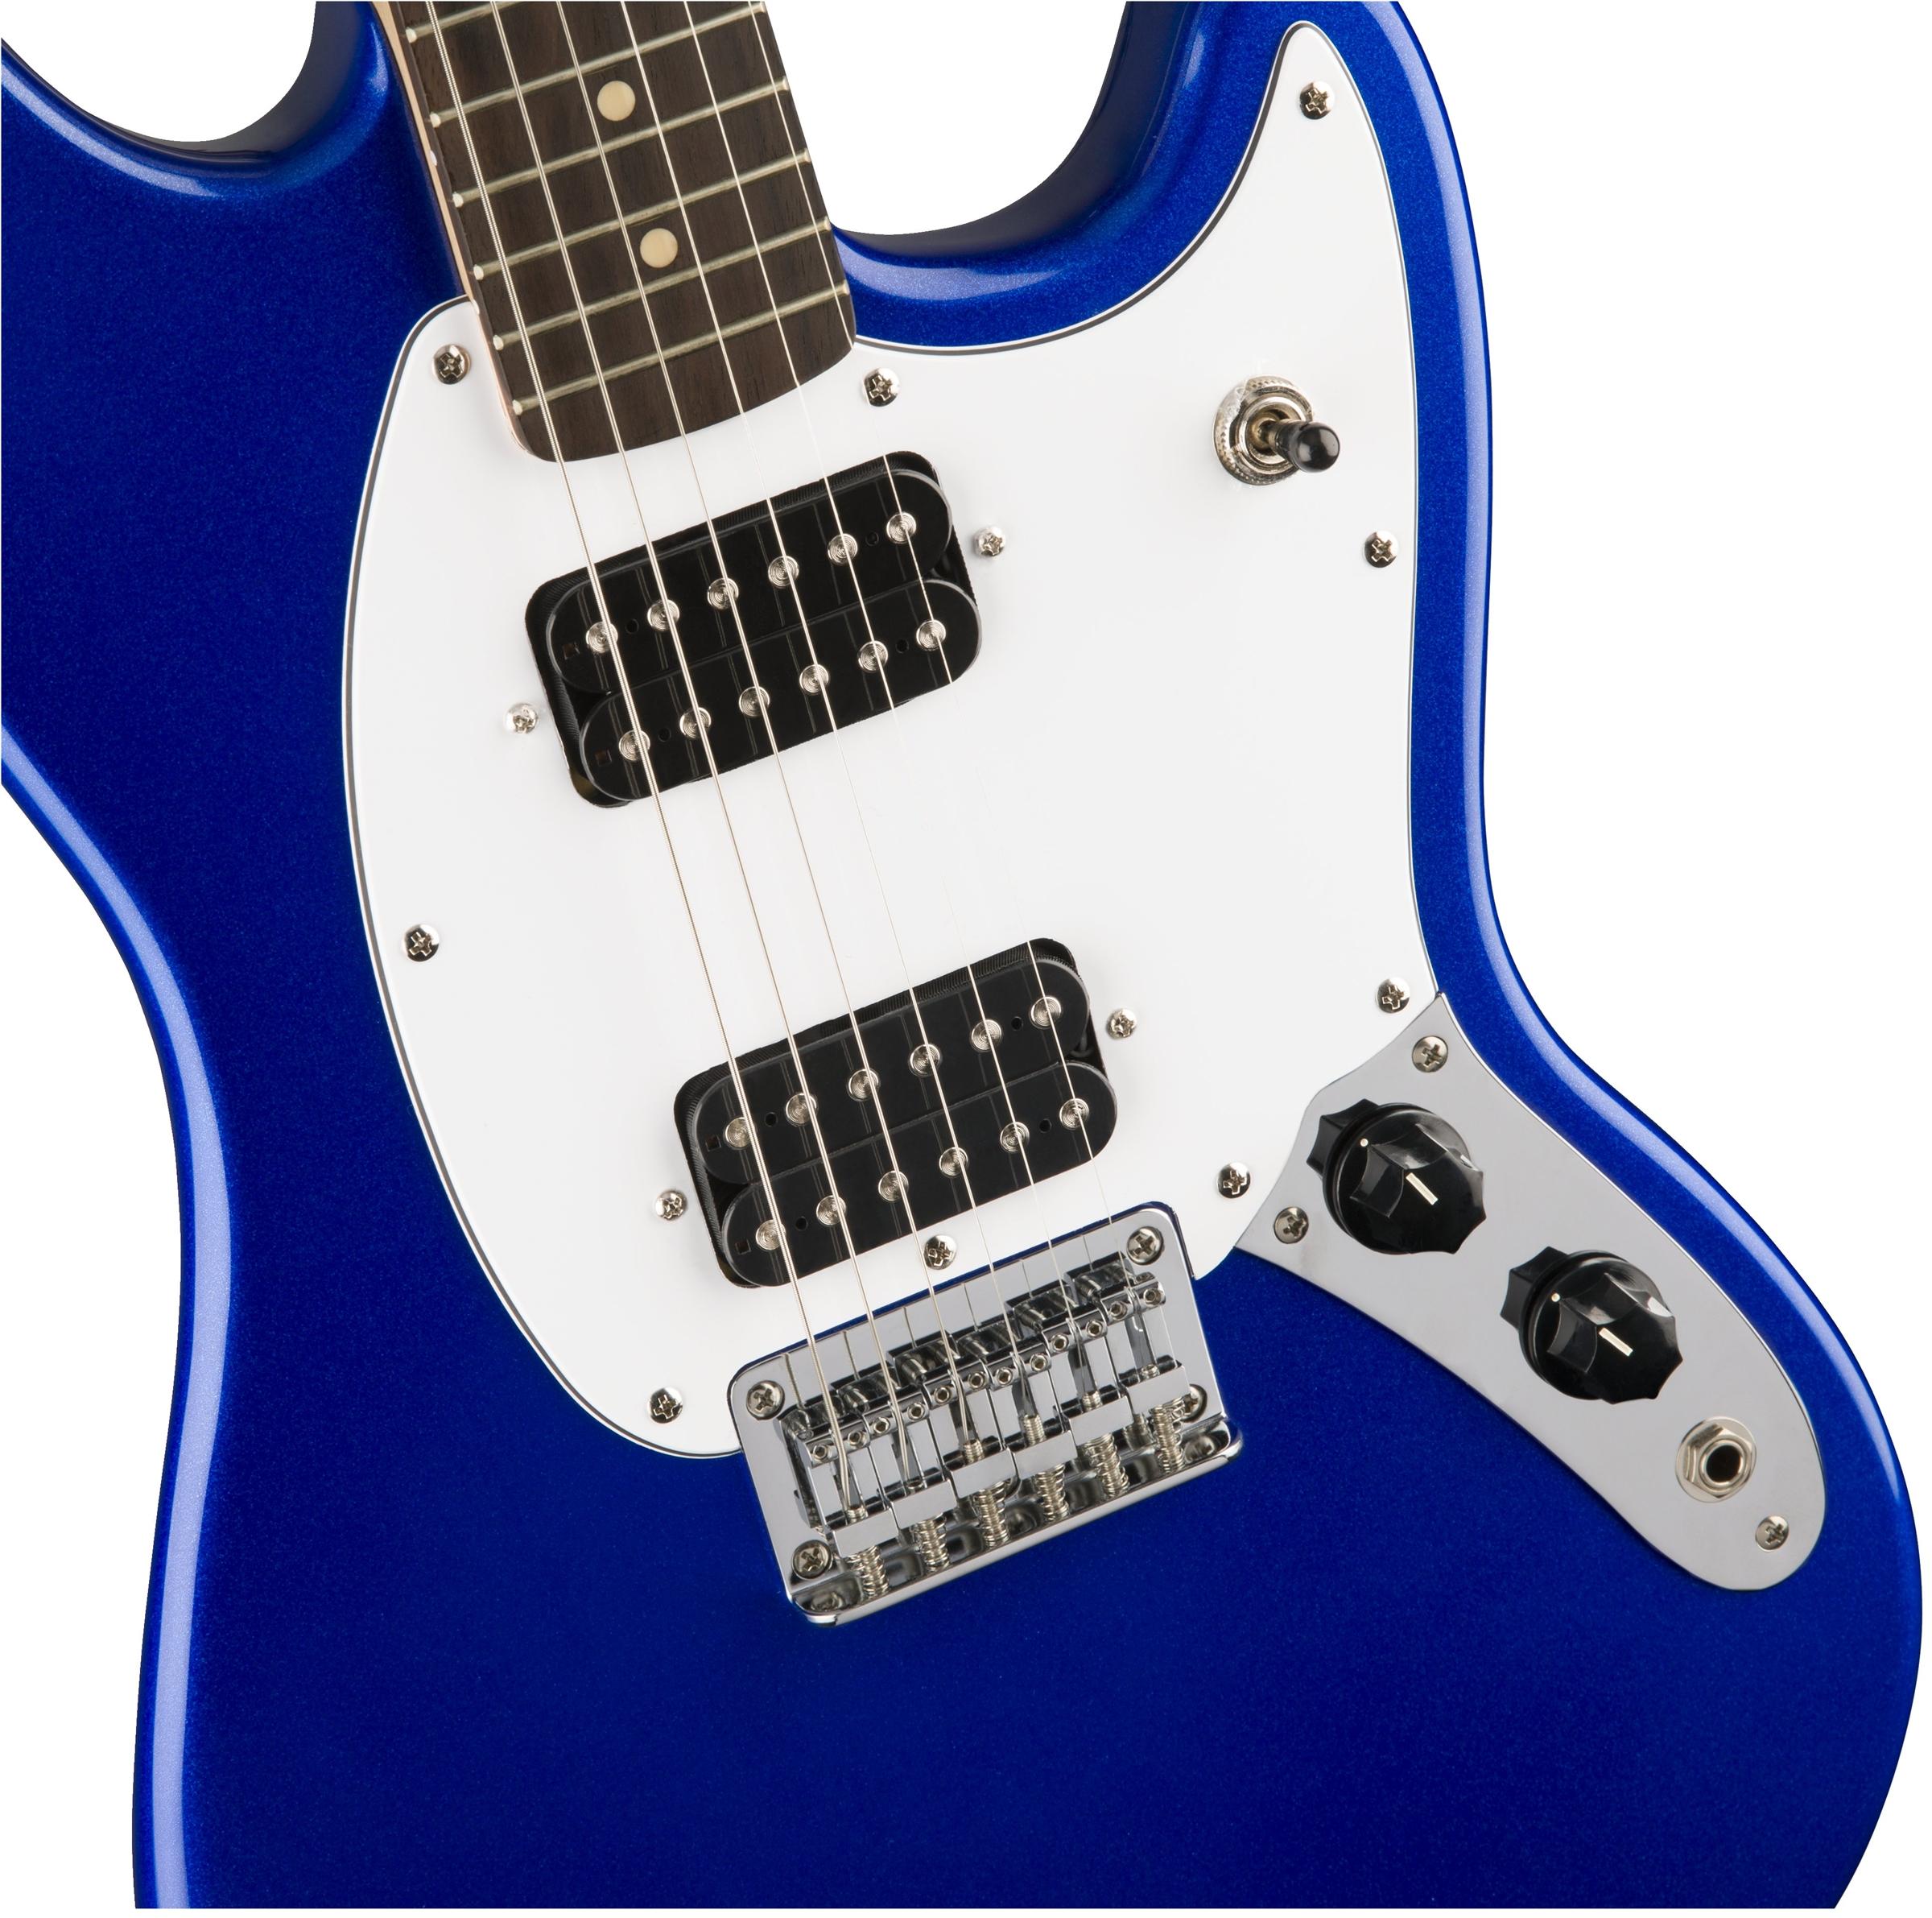 Bullet Mustang Hh Squier Electric Guitars Acoustasonic Telecaster Wiring Diagram